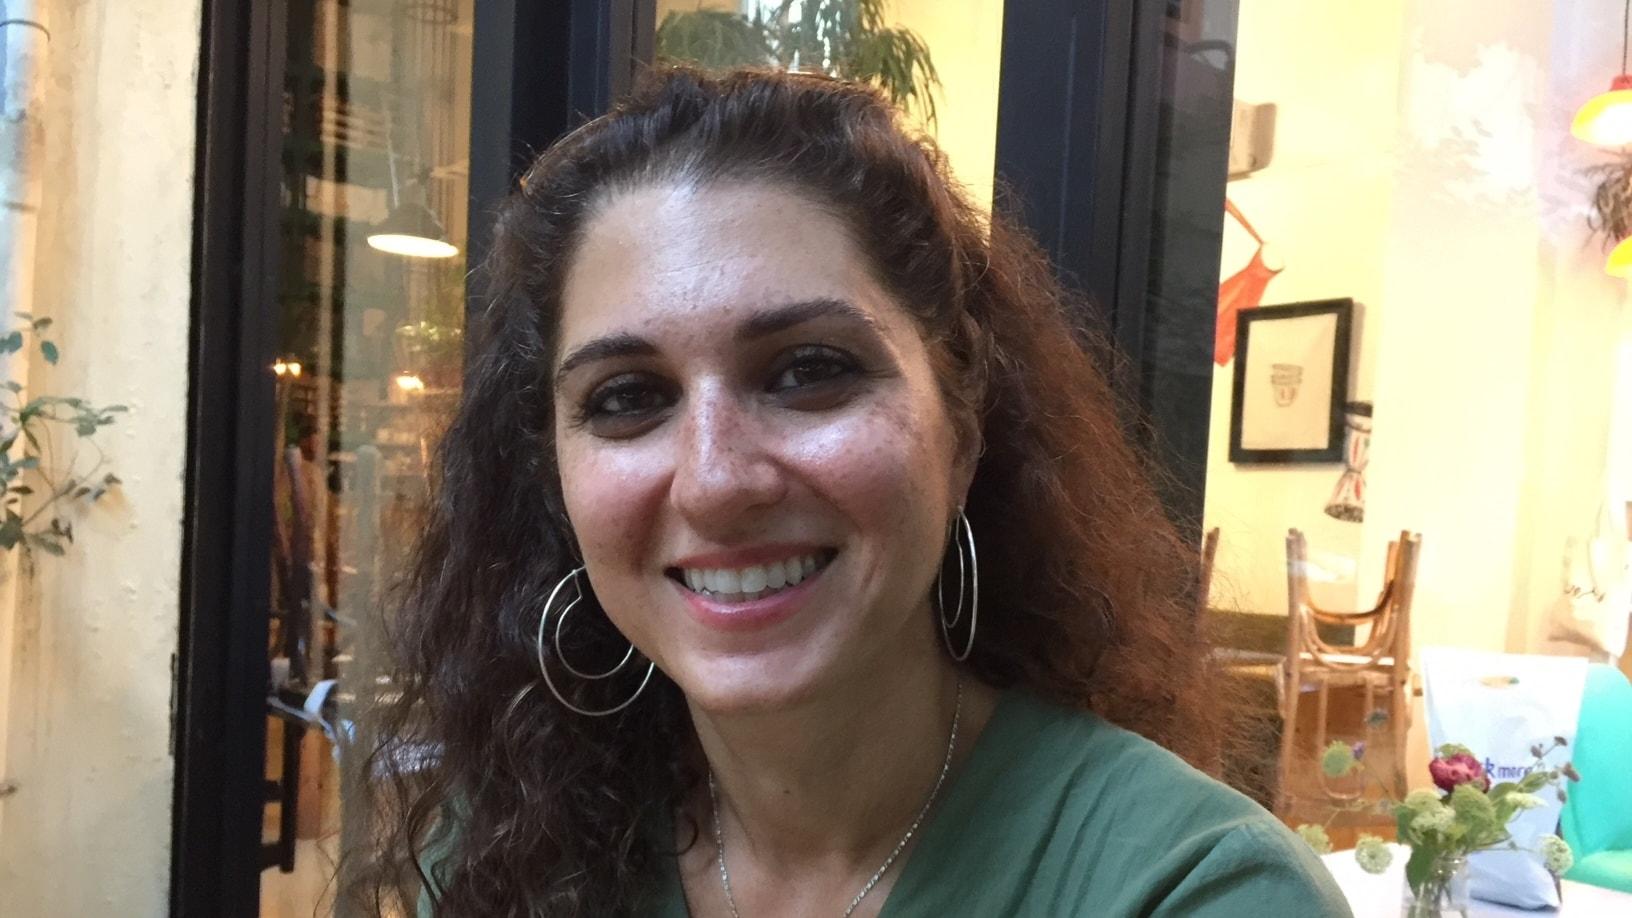 Alia Maleks släktkrönika om Assad-regimens tysta stöd